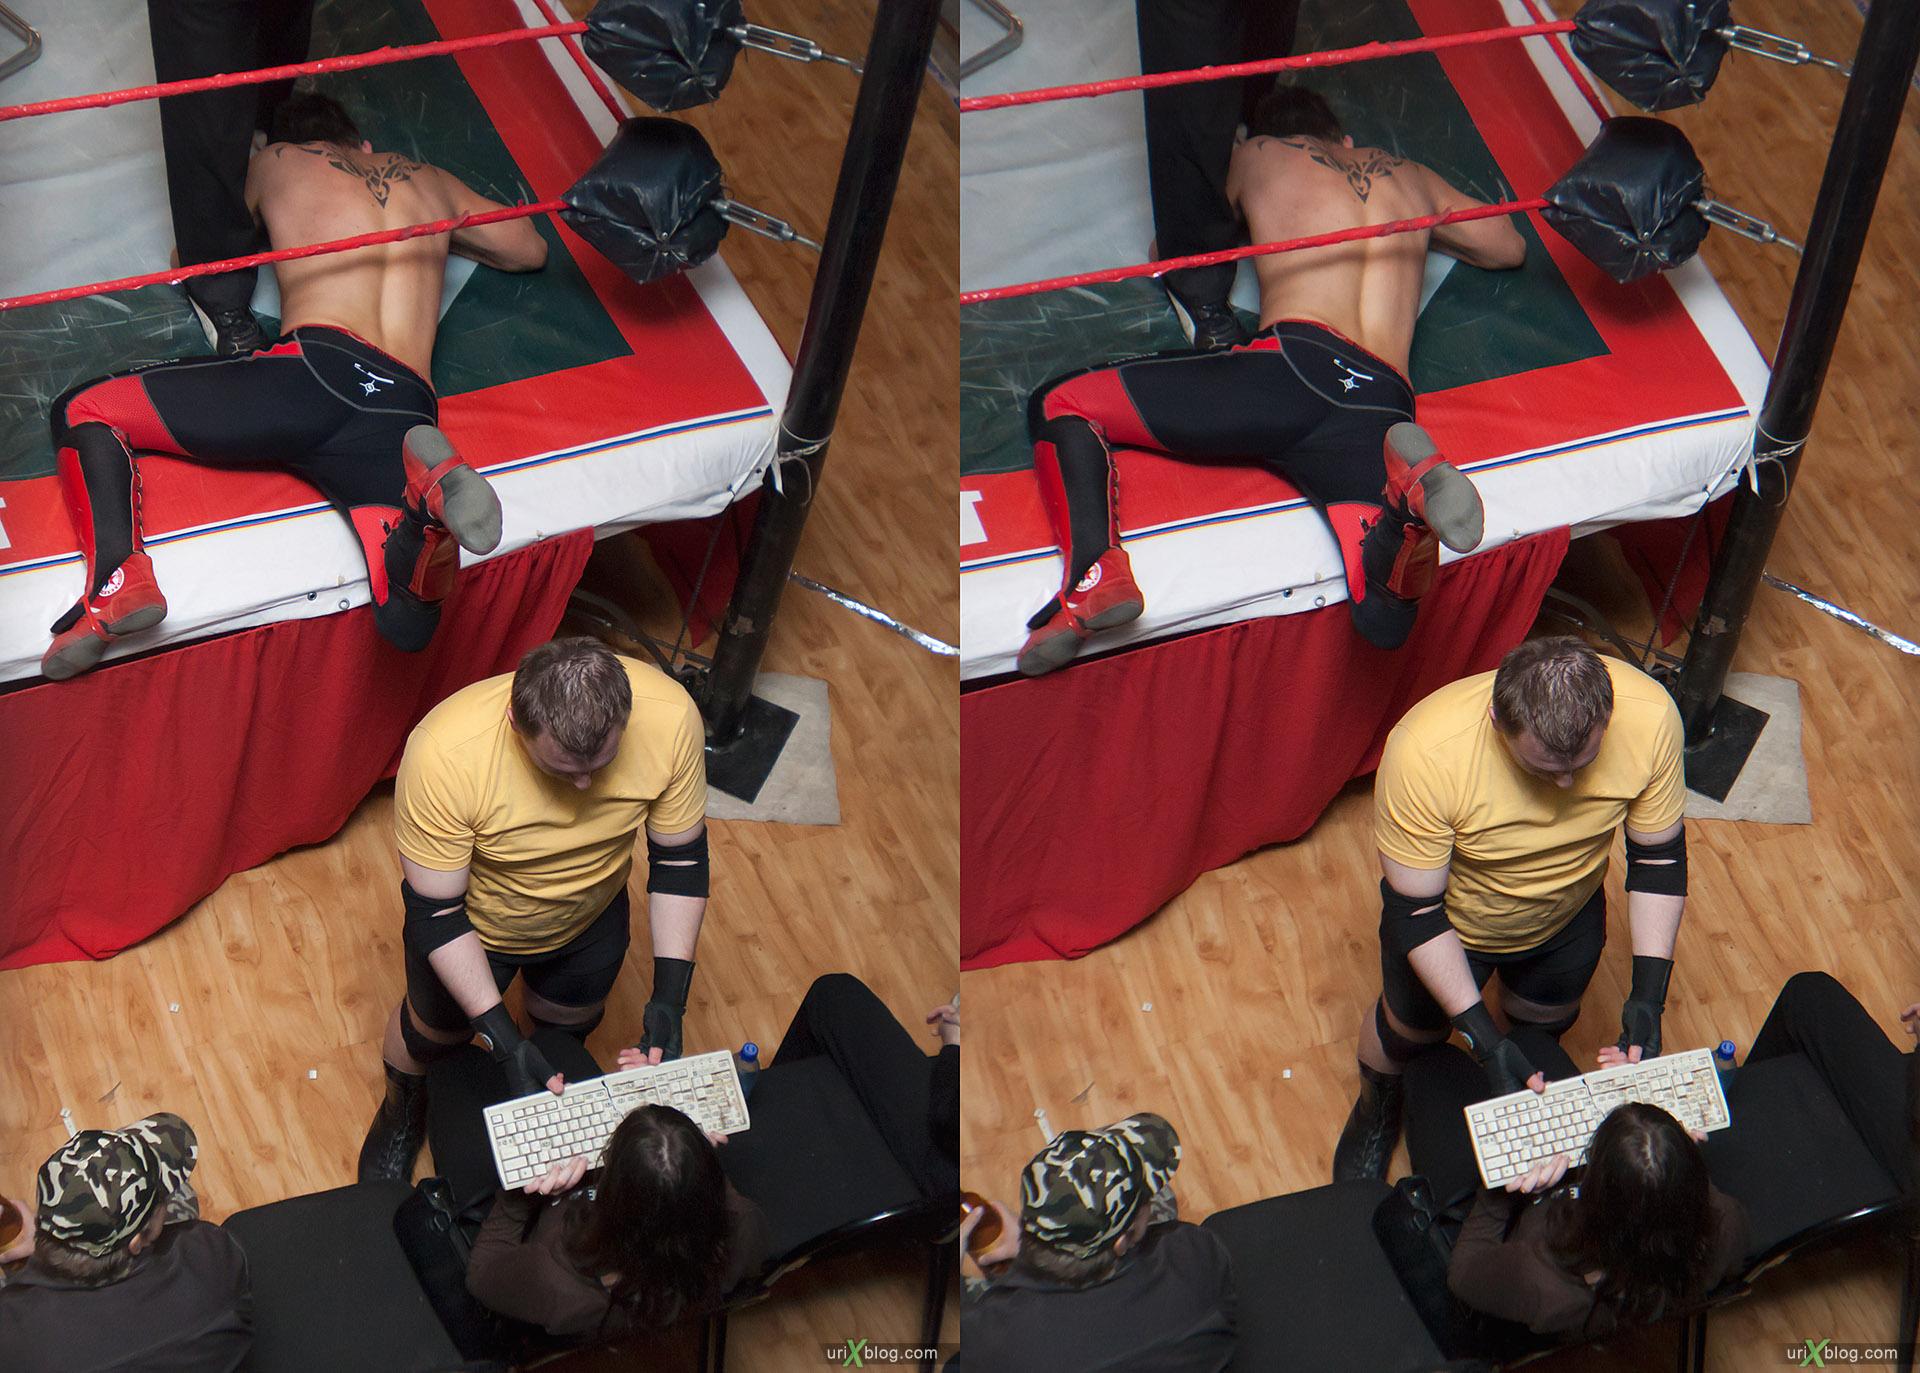 2011 Реслинг Wrestling НФР Опасная зона Moscow, 3D, stereo, cross-eyed, стерео, стереопара, Москва, Loreo 3D lens in a cap